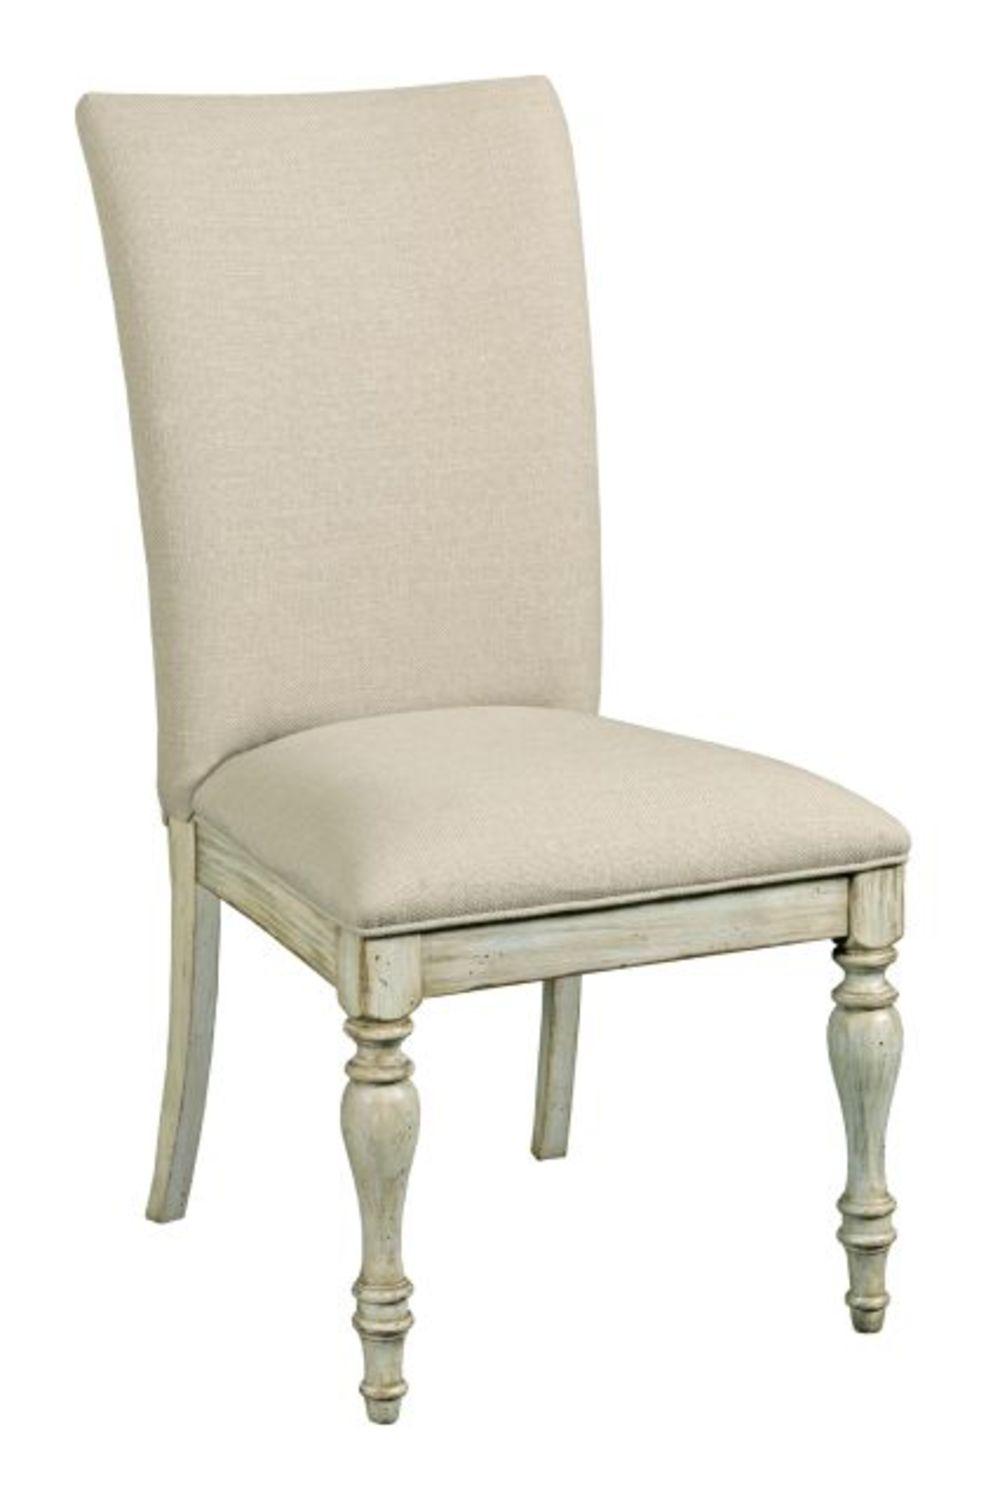 KINCAID FURNITURE CO, INC - Tasman Upholstered Chair